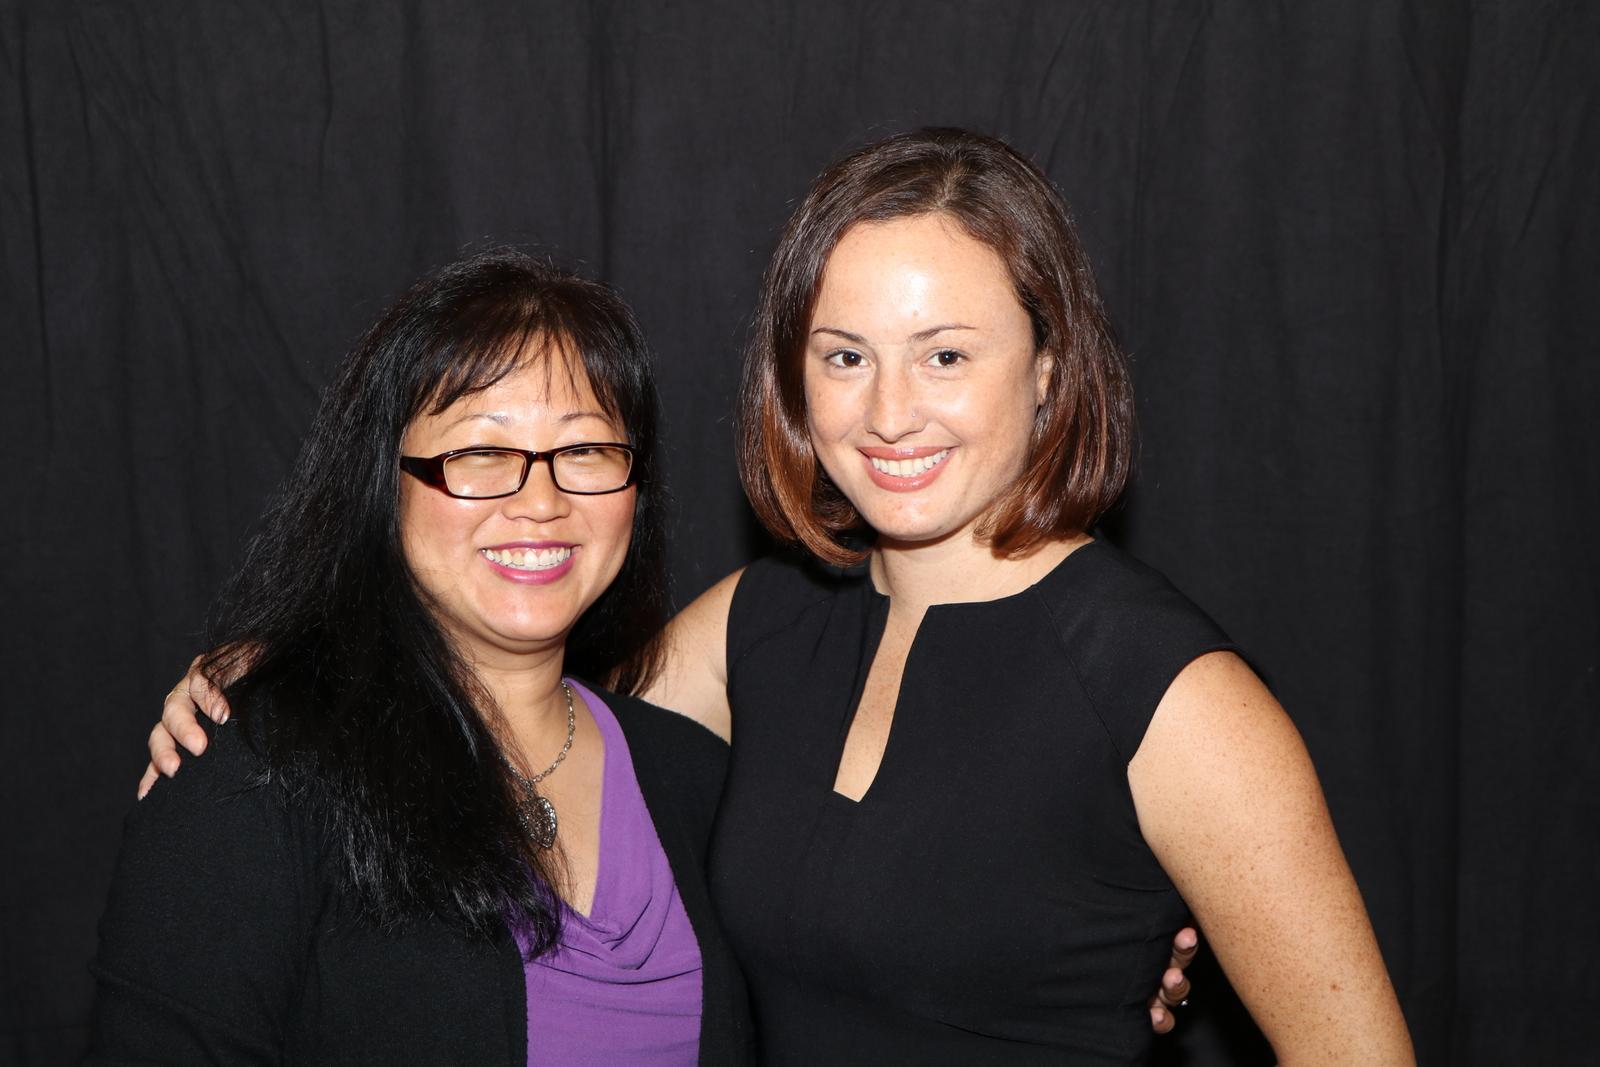 Claire Akau & Lara Hughes